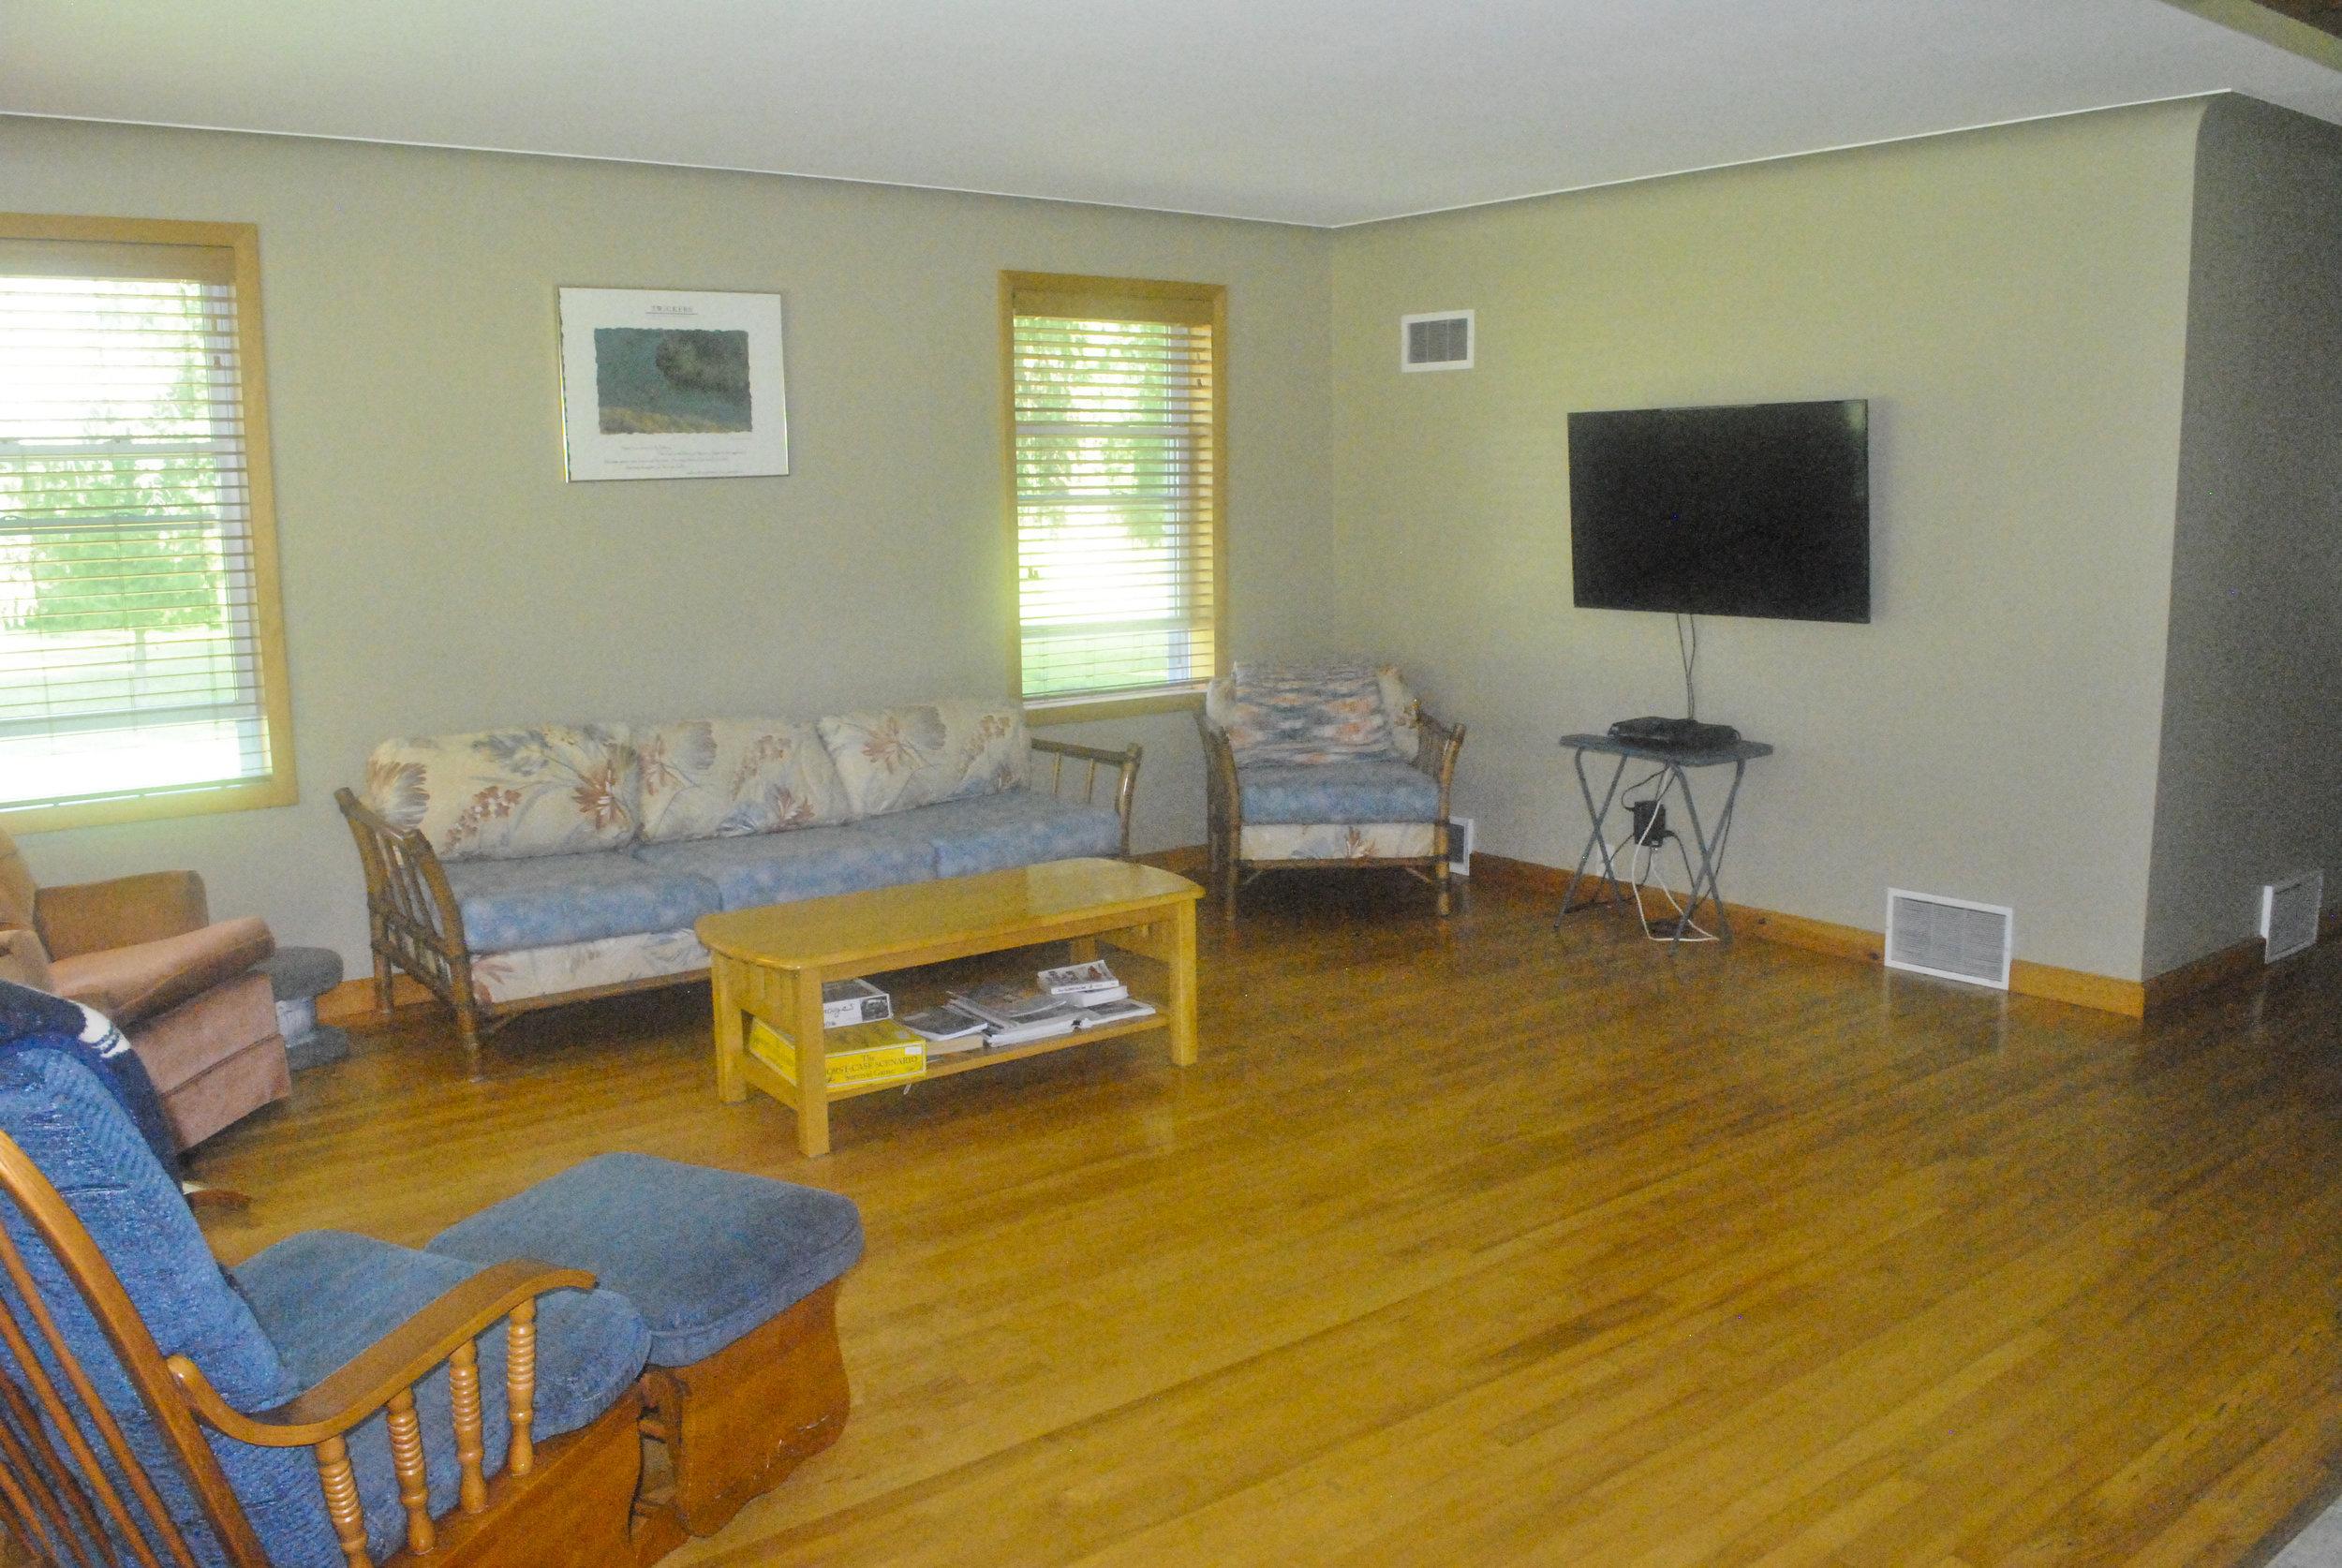 Yettaw House Living Room.jpg